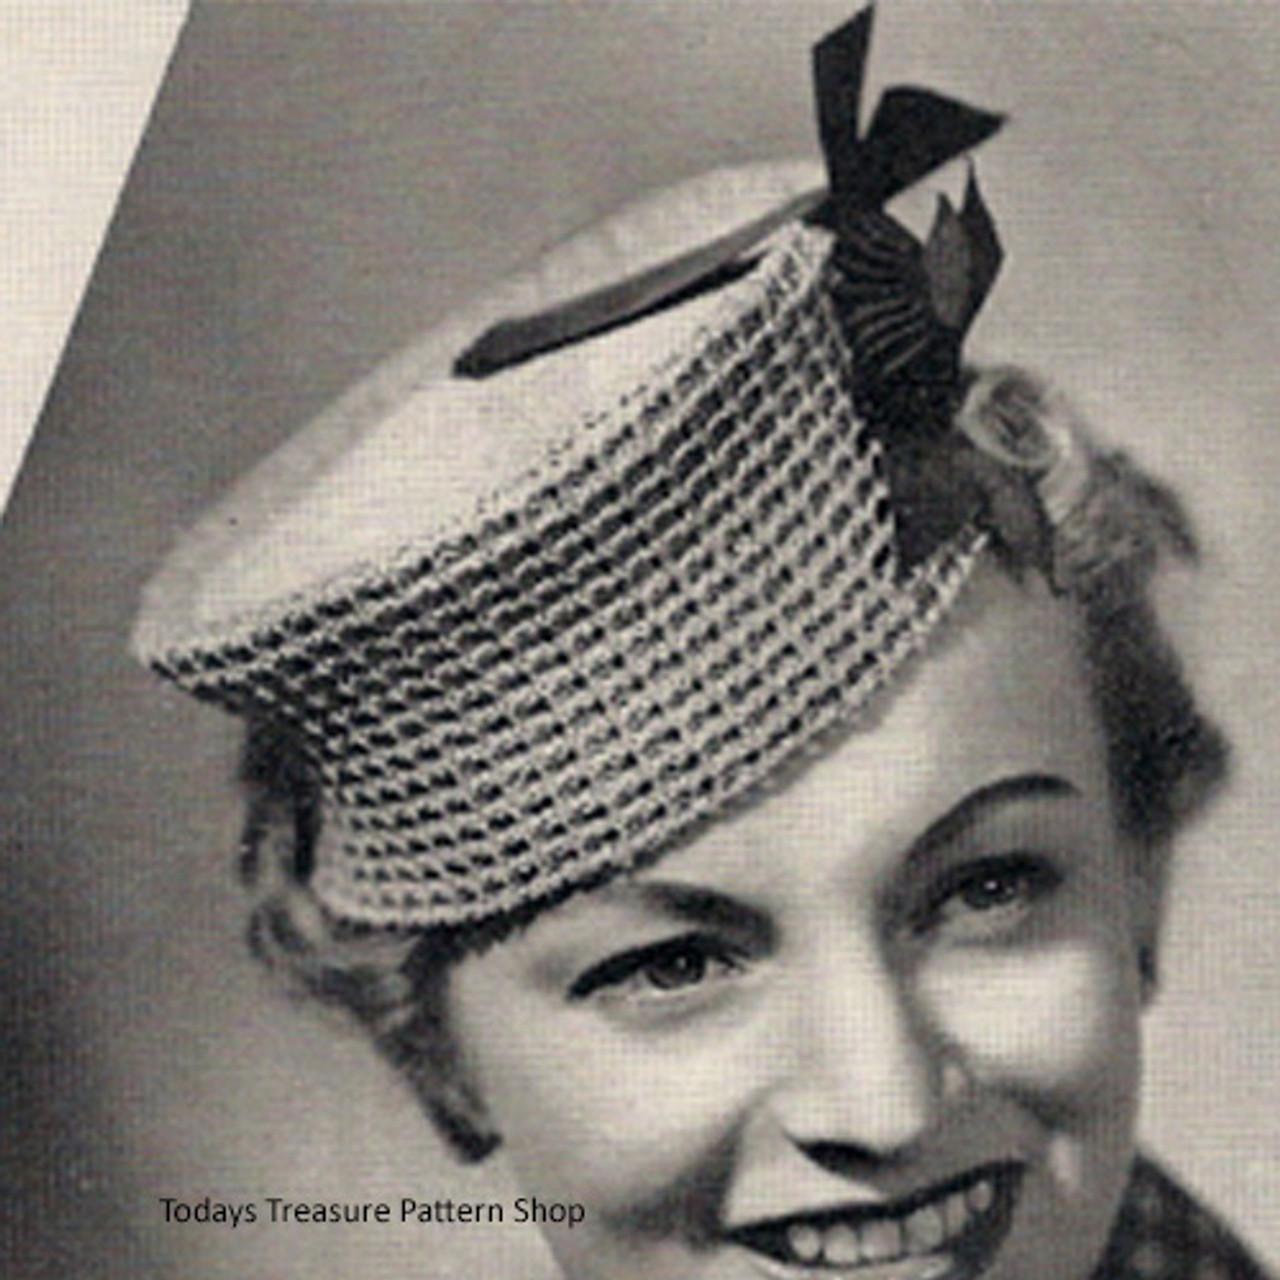 Easy Crocheted Pillbox Hat Pattern, Vintage 1930s